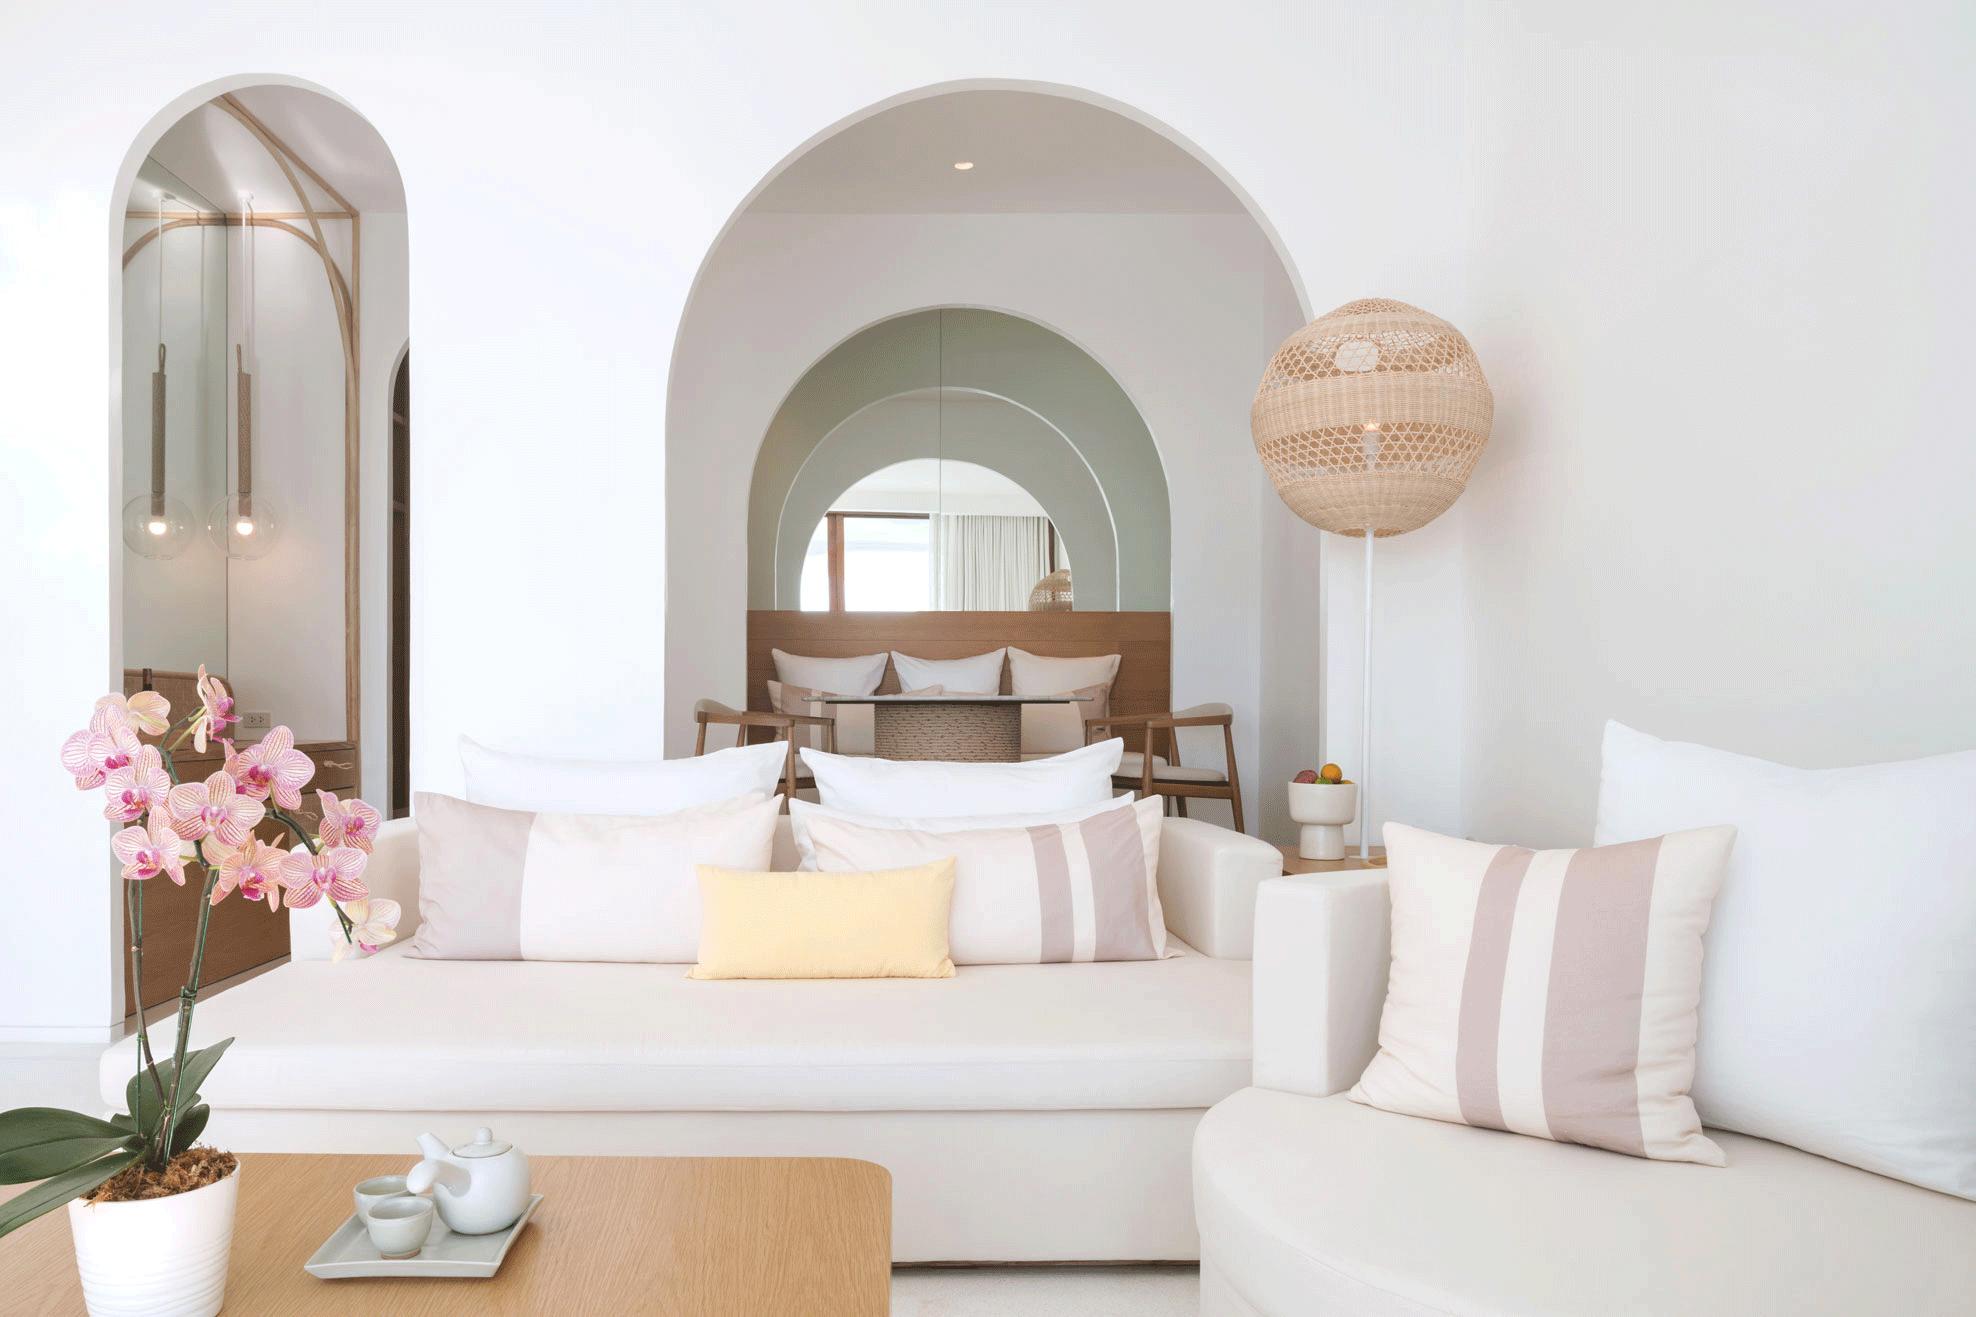 SALA-Room-1BedroomPoolSuite-09.png